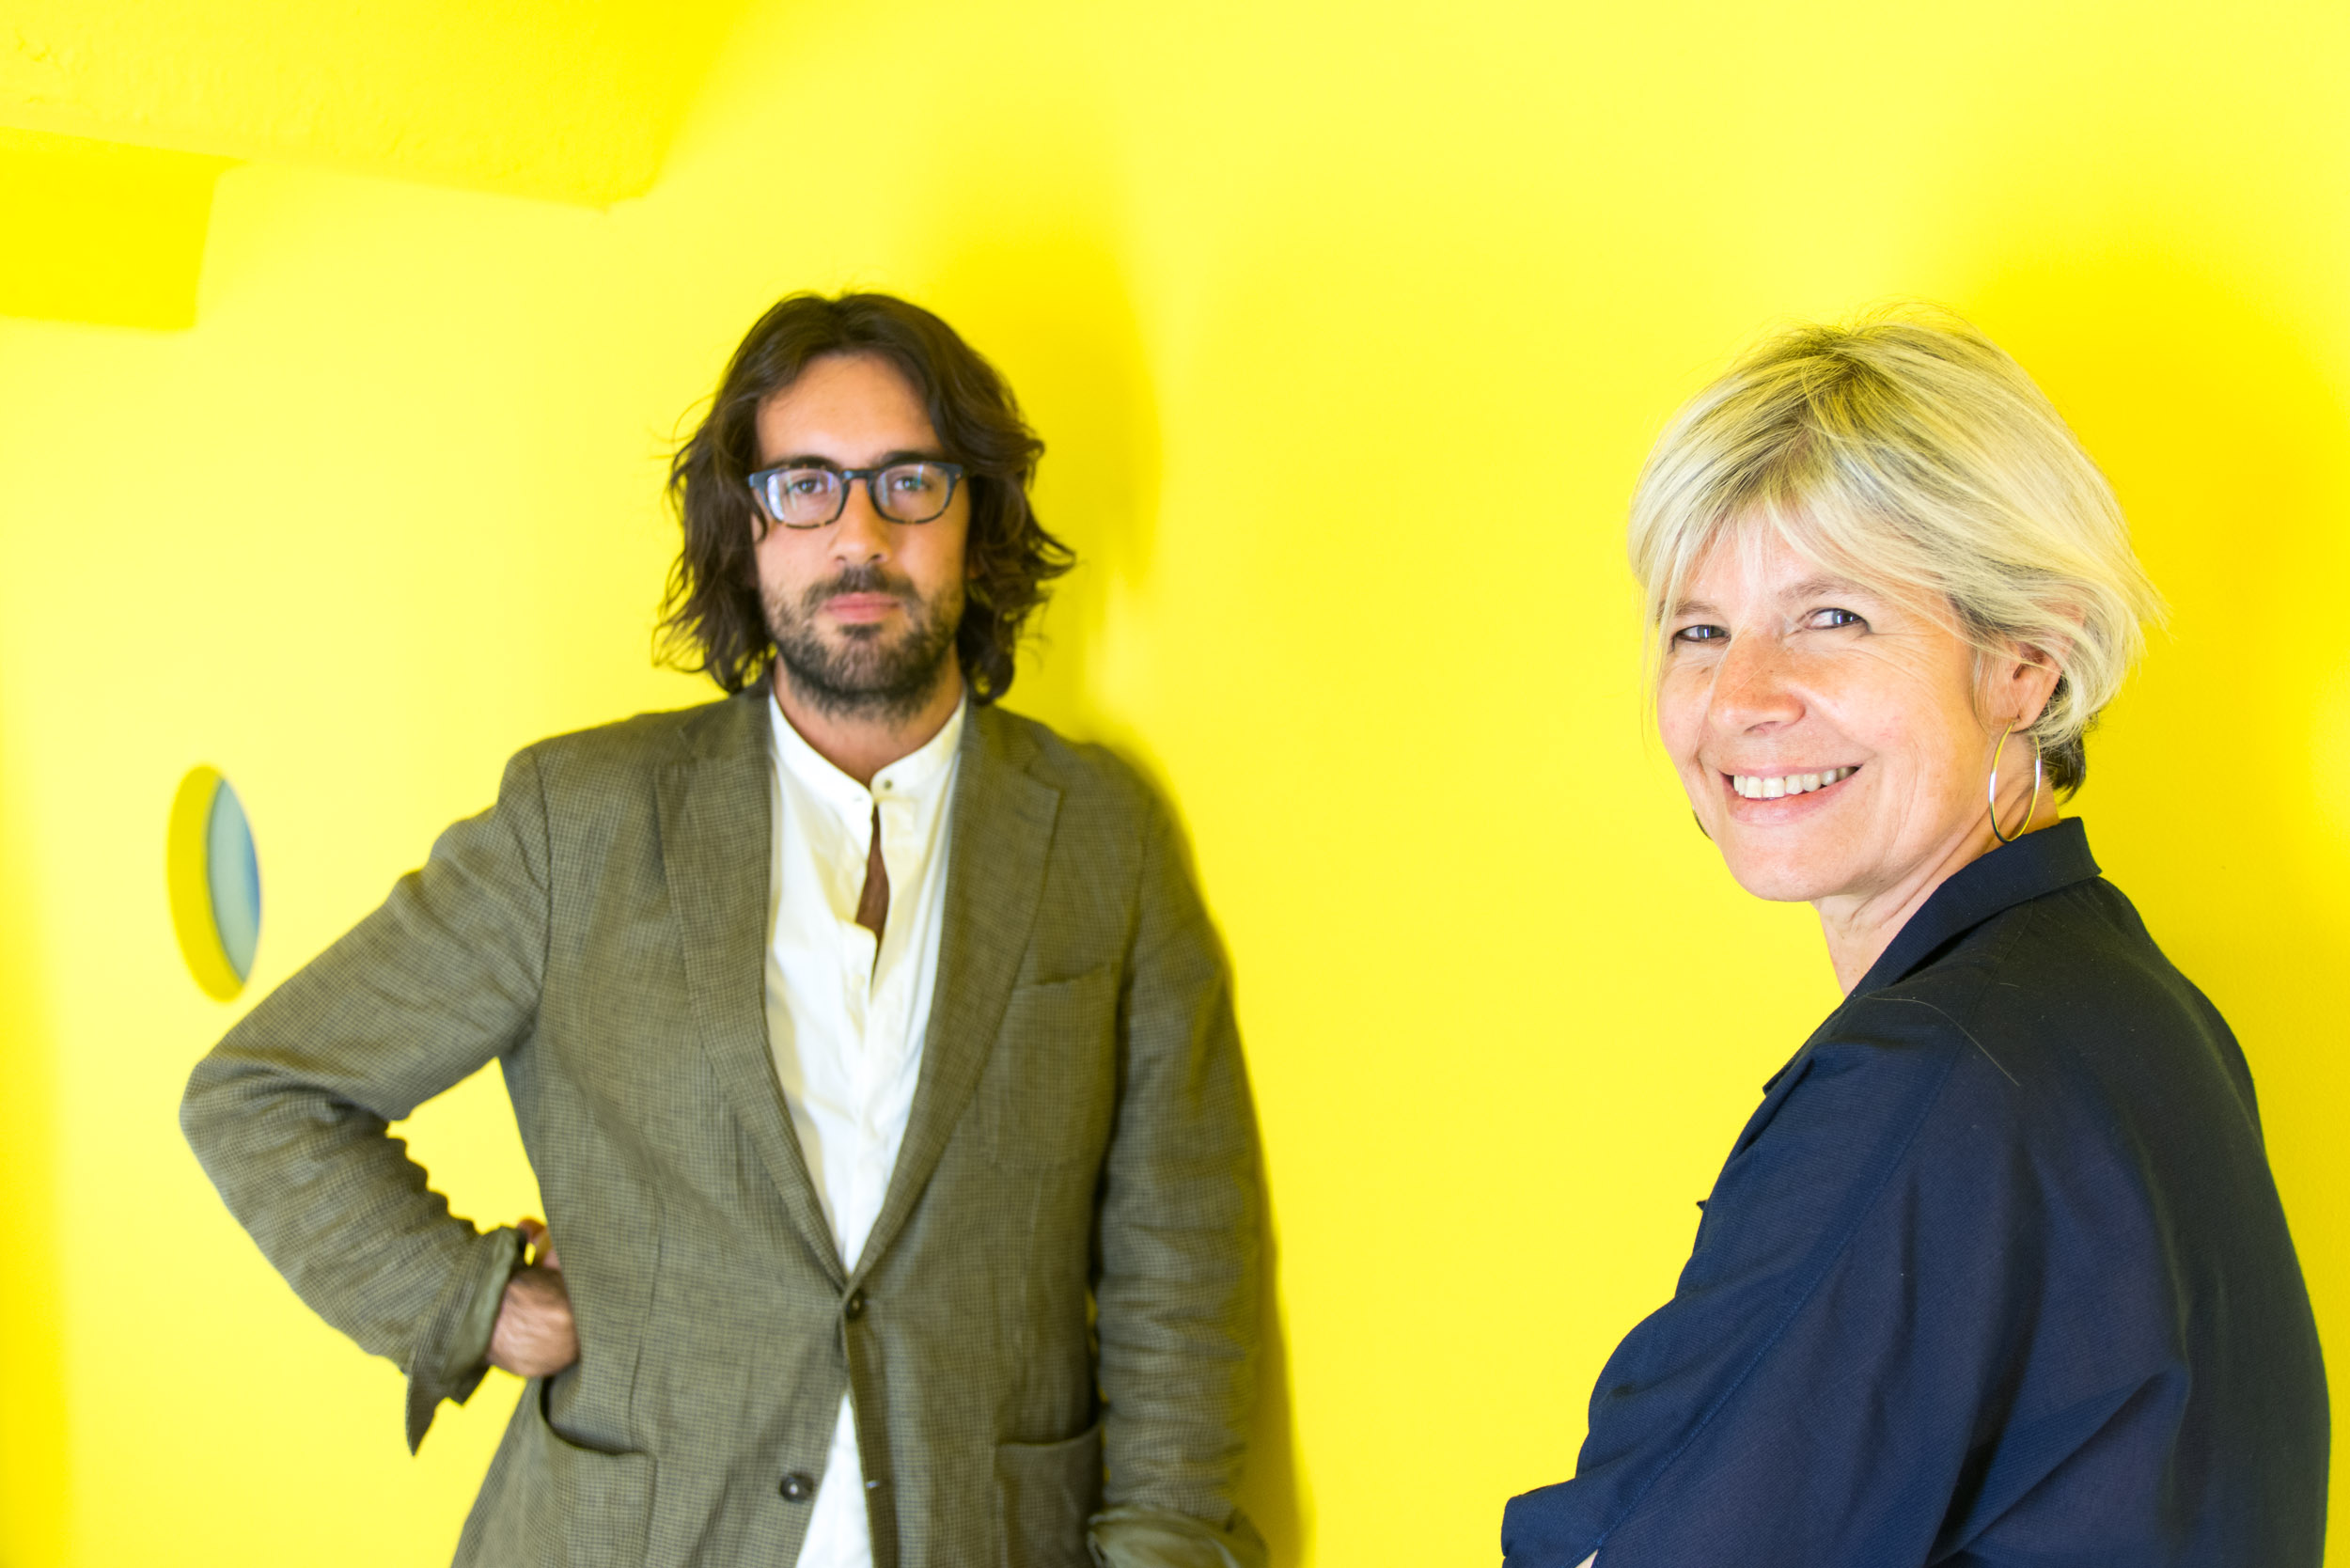 Clara Tosi Pamphili e Alessio de Navasques - A.I. Artisanal Intelligence, Milano 2016 - photo Andrea Buccella